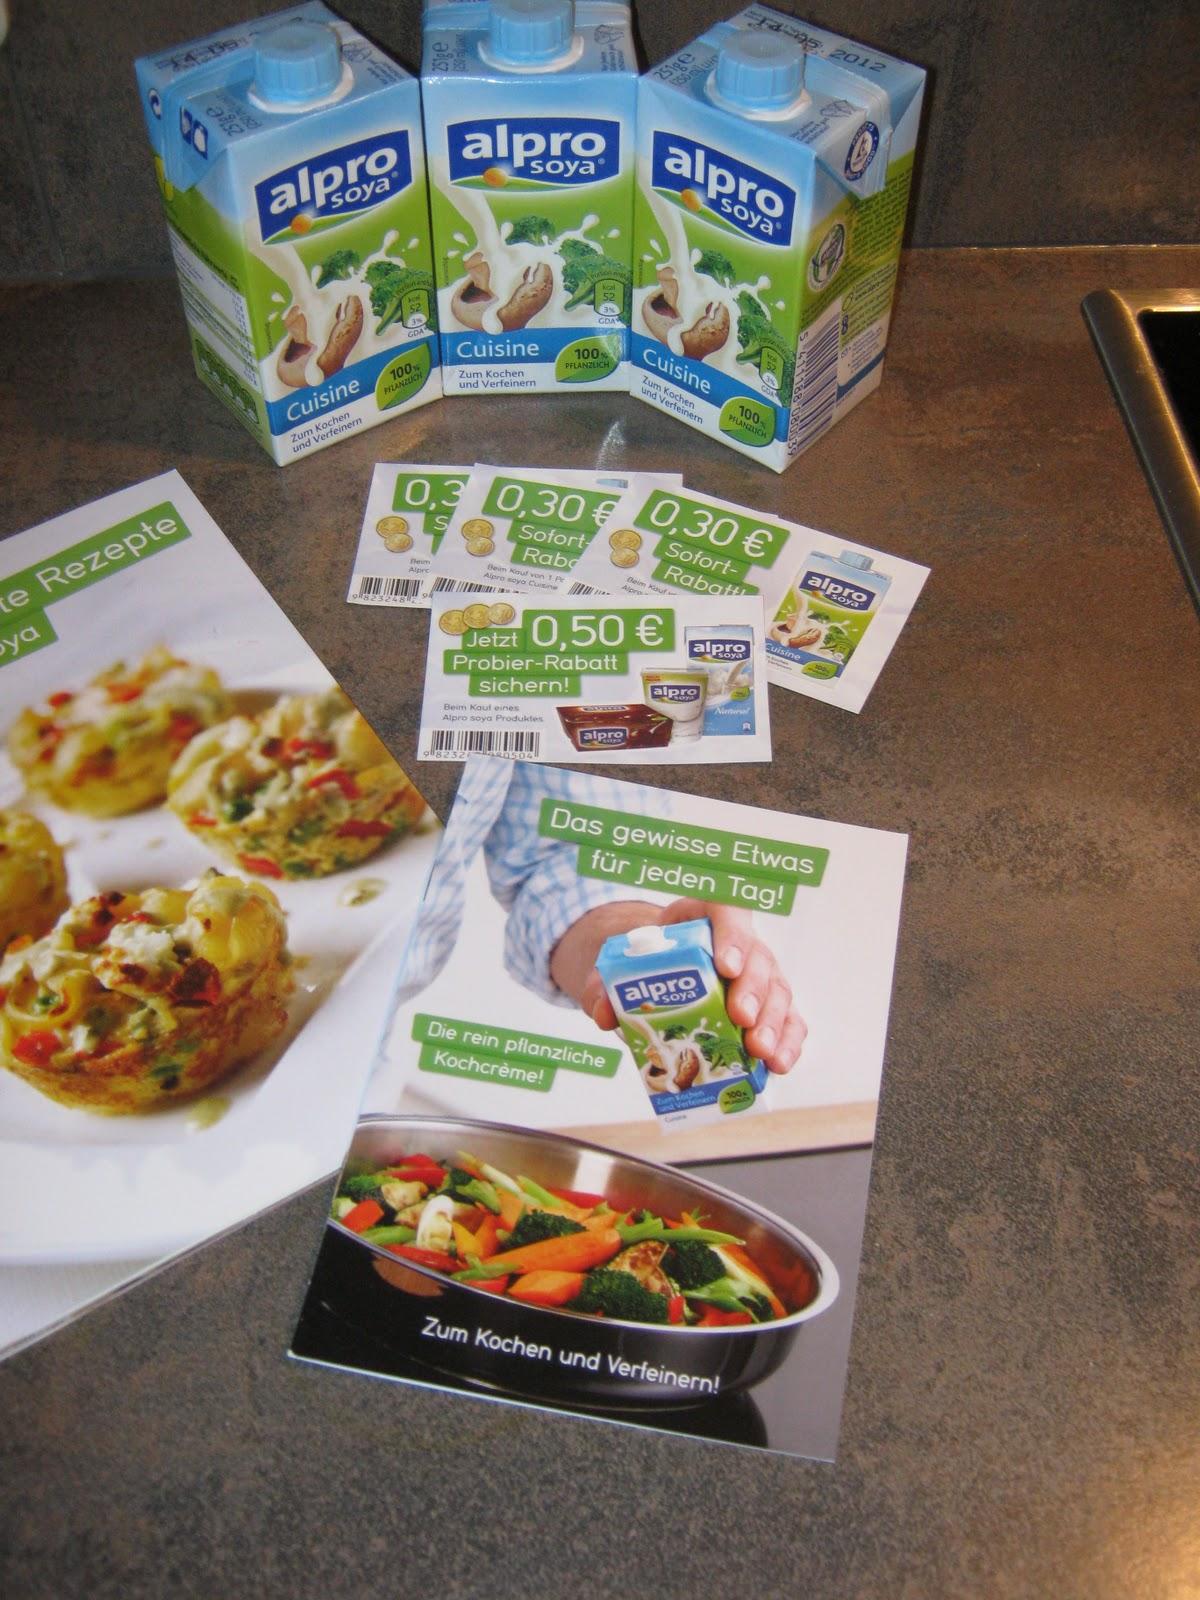 R bes testblog alpro soya cuisine for Alpro soja cuisine